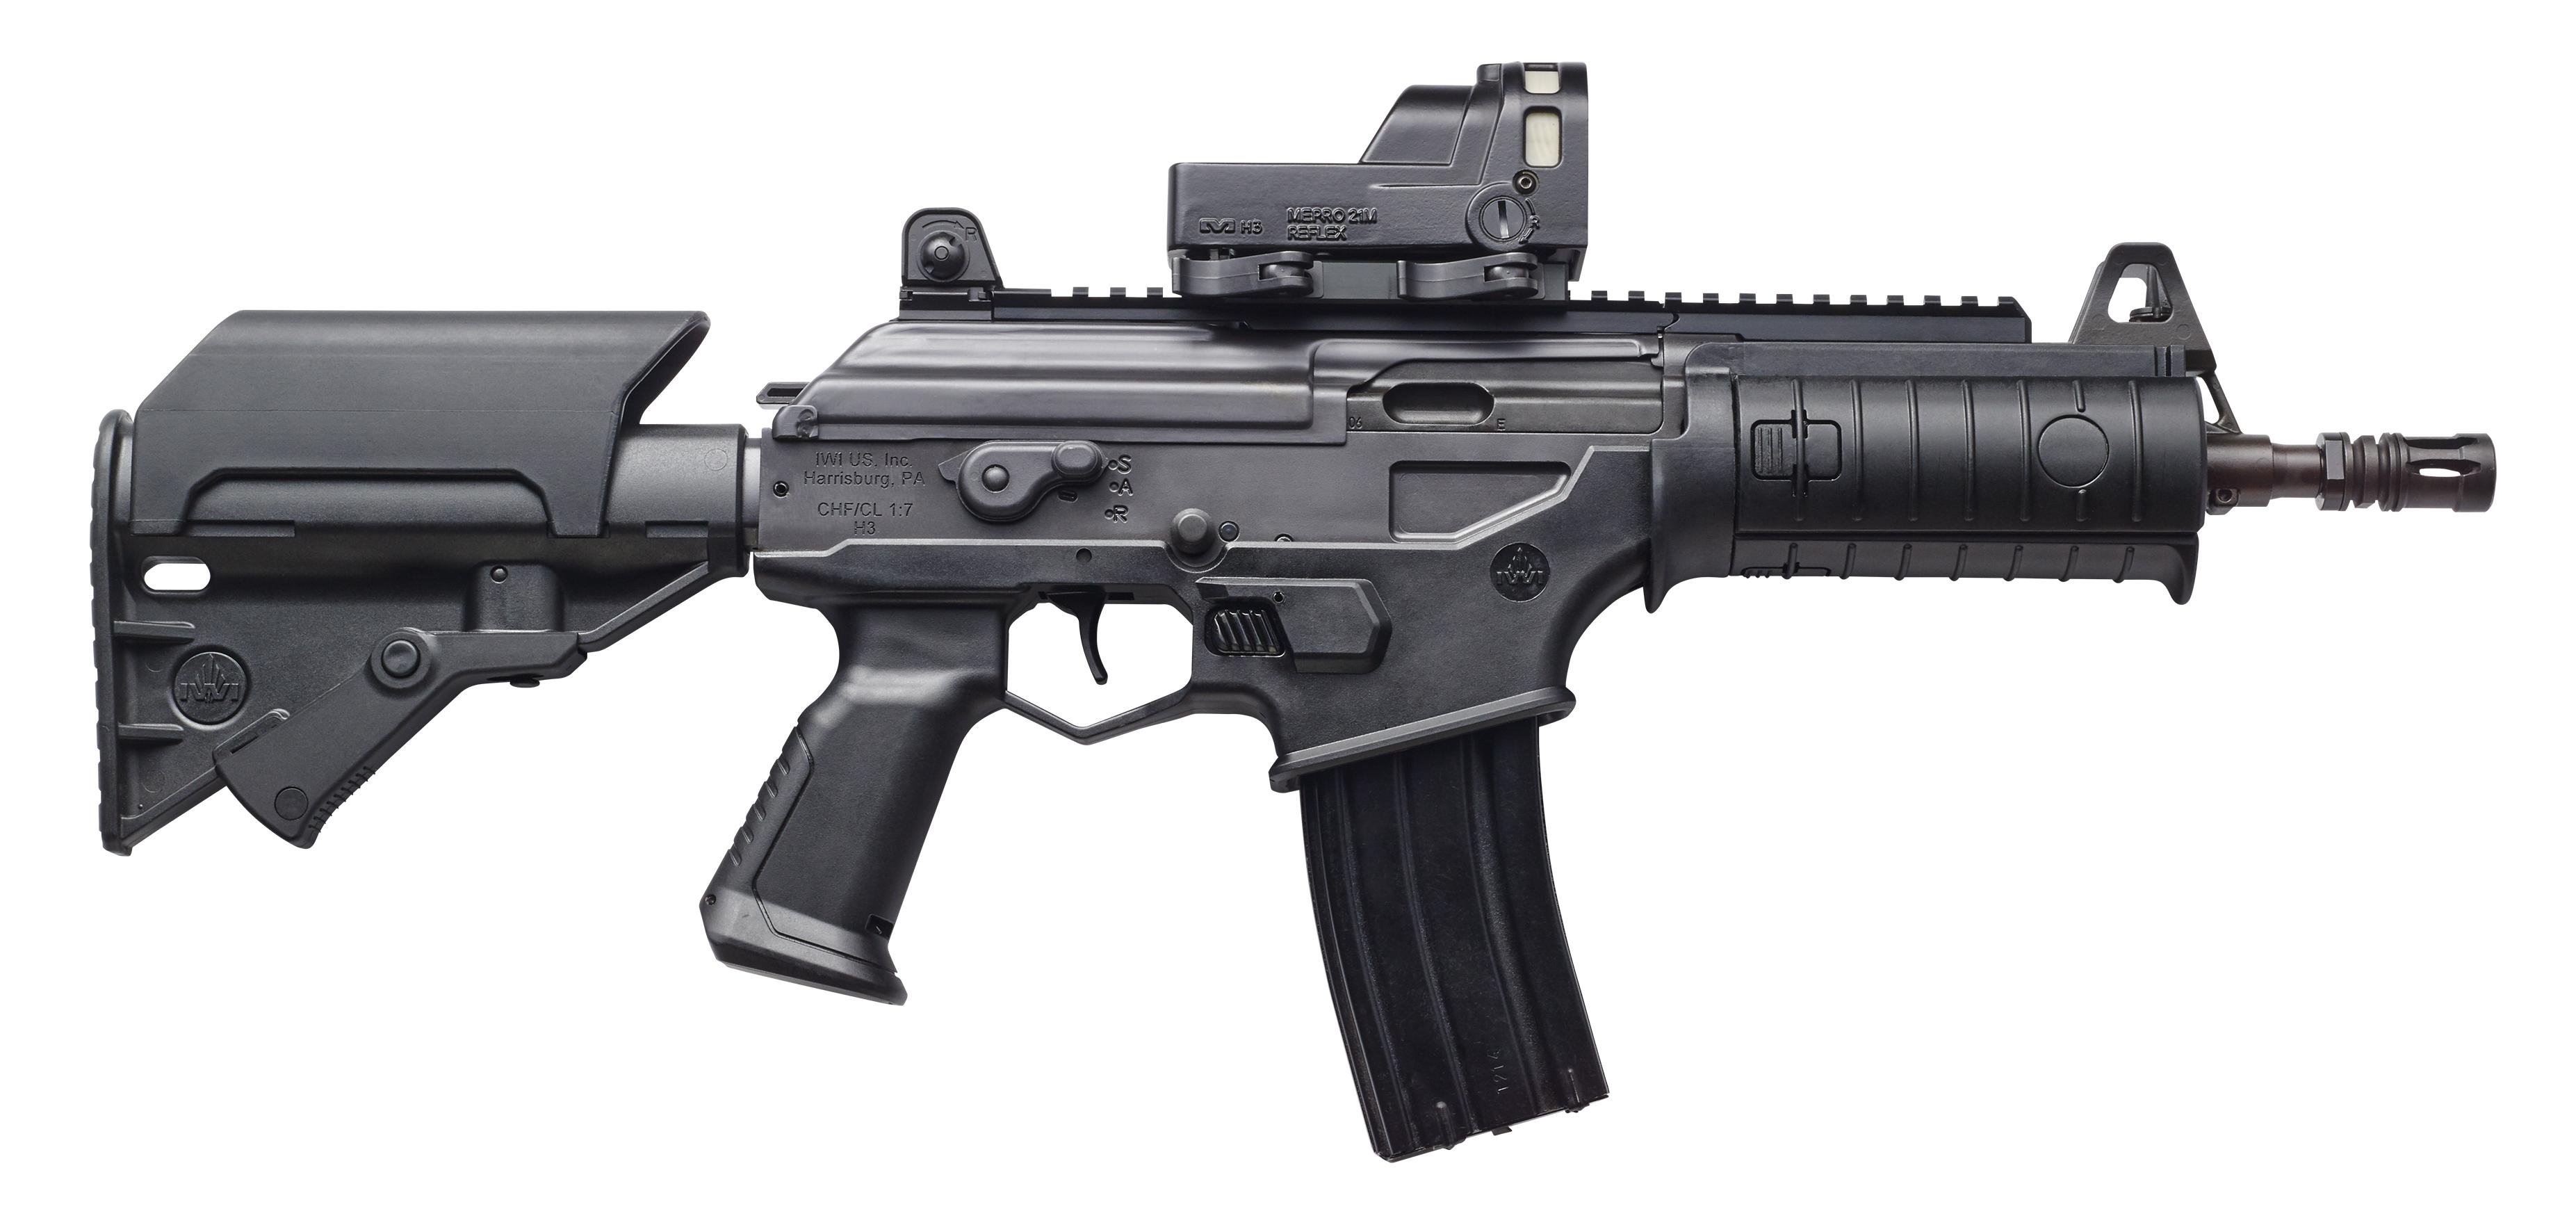 Galil ACE 21N – 5.56 NATO | IWI US, Inc.